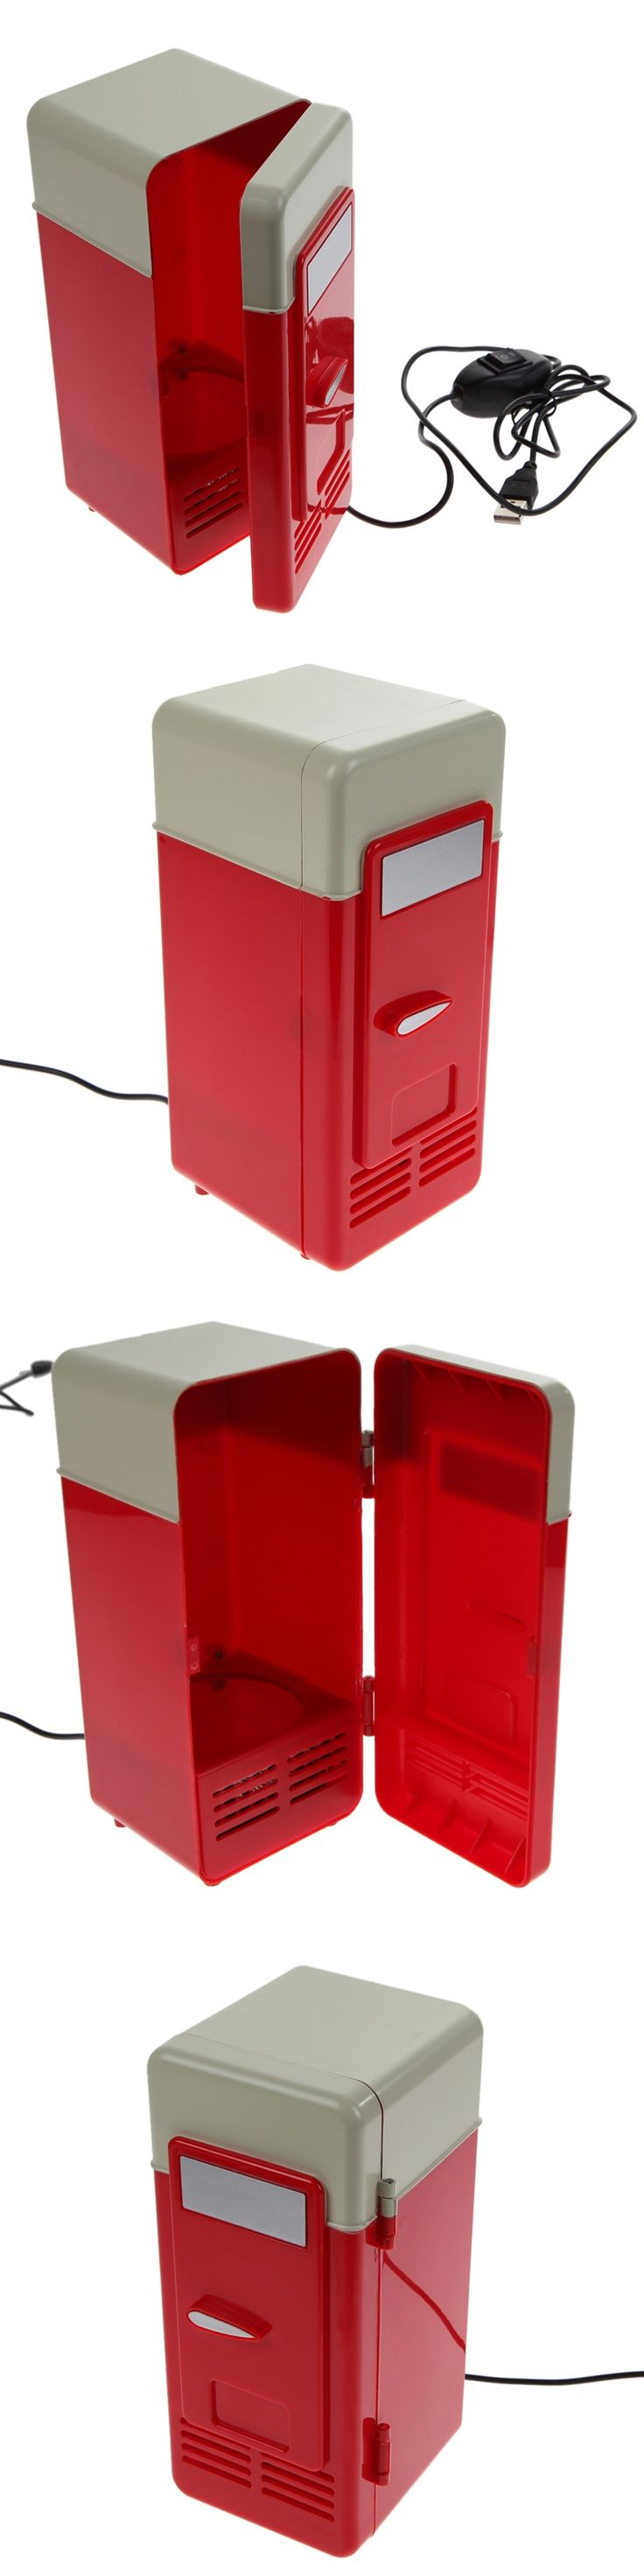 Red Desktop Mini USB Gadget Beverage Cans Cooler  Warmer Refrigerator Car Mini Fridge